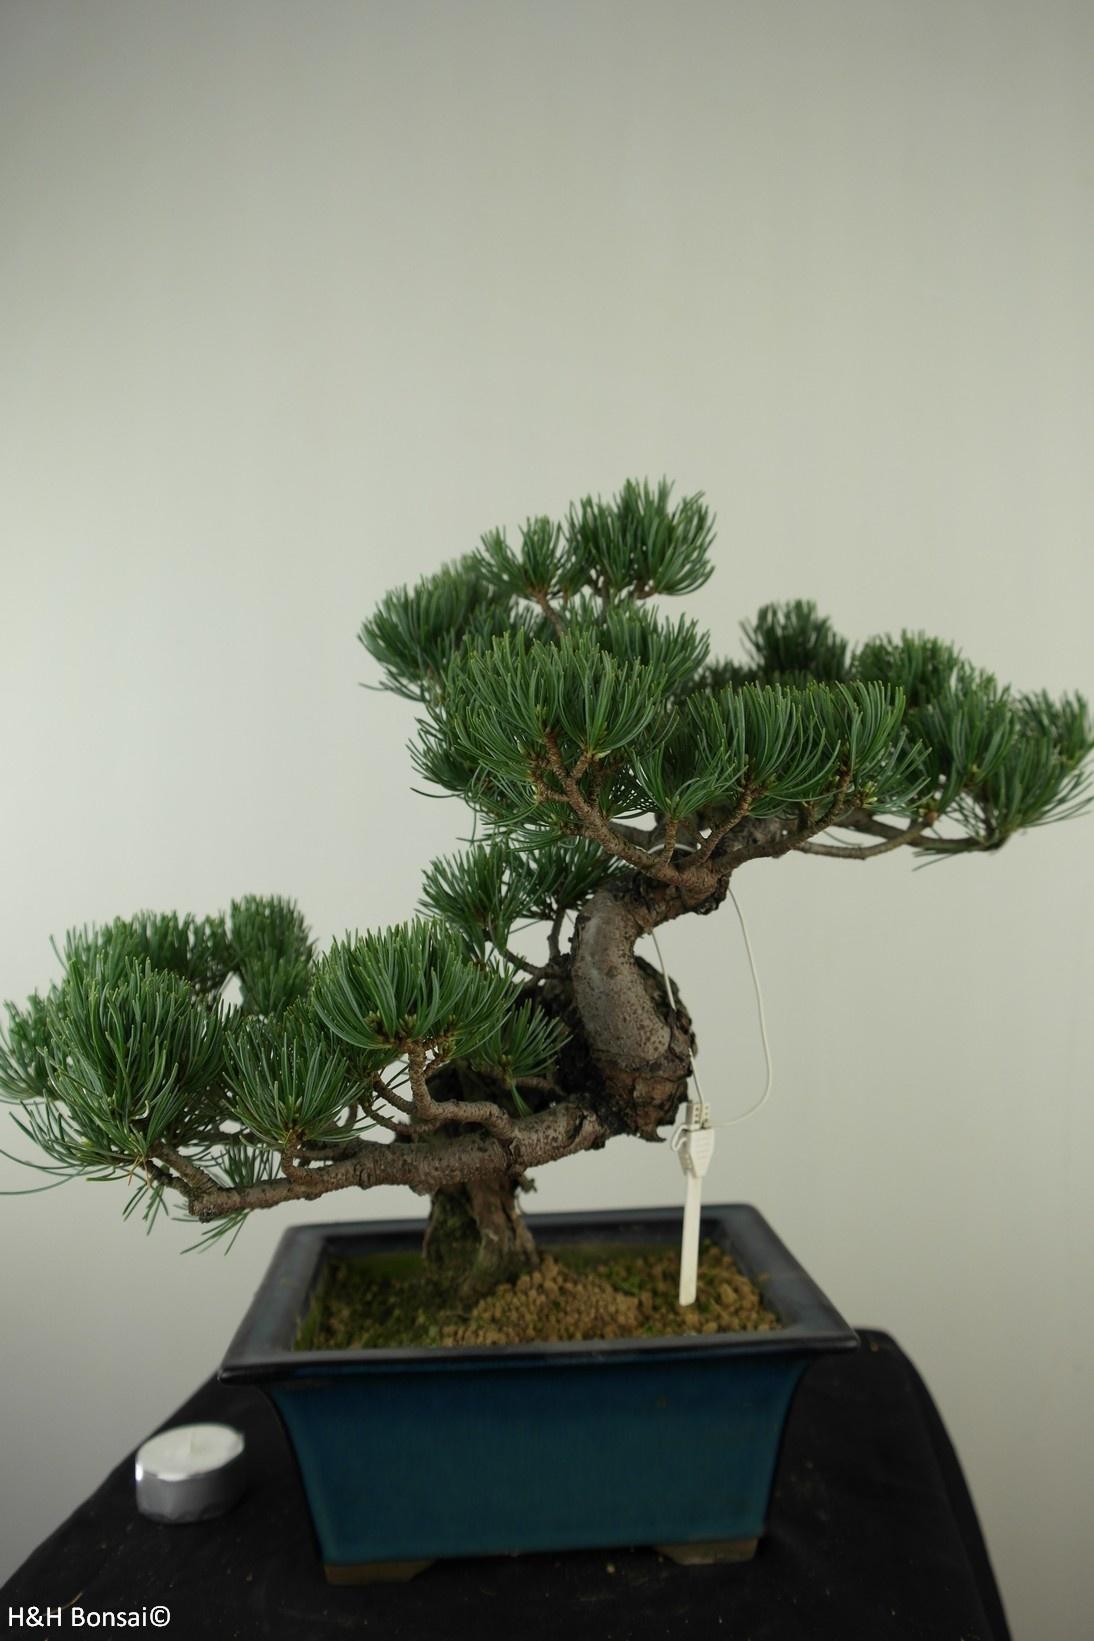 Bonsai Mädchenkiefer, Pinus pentaphylla, nr. 7812